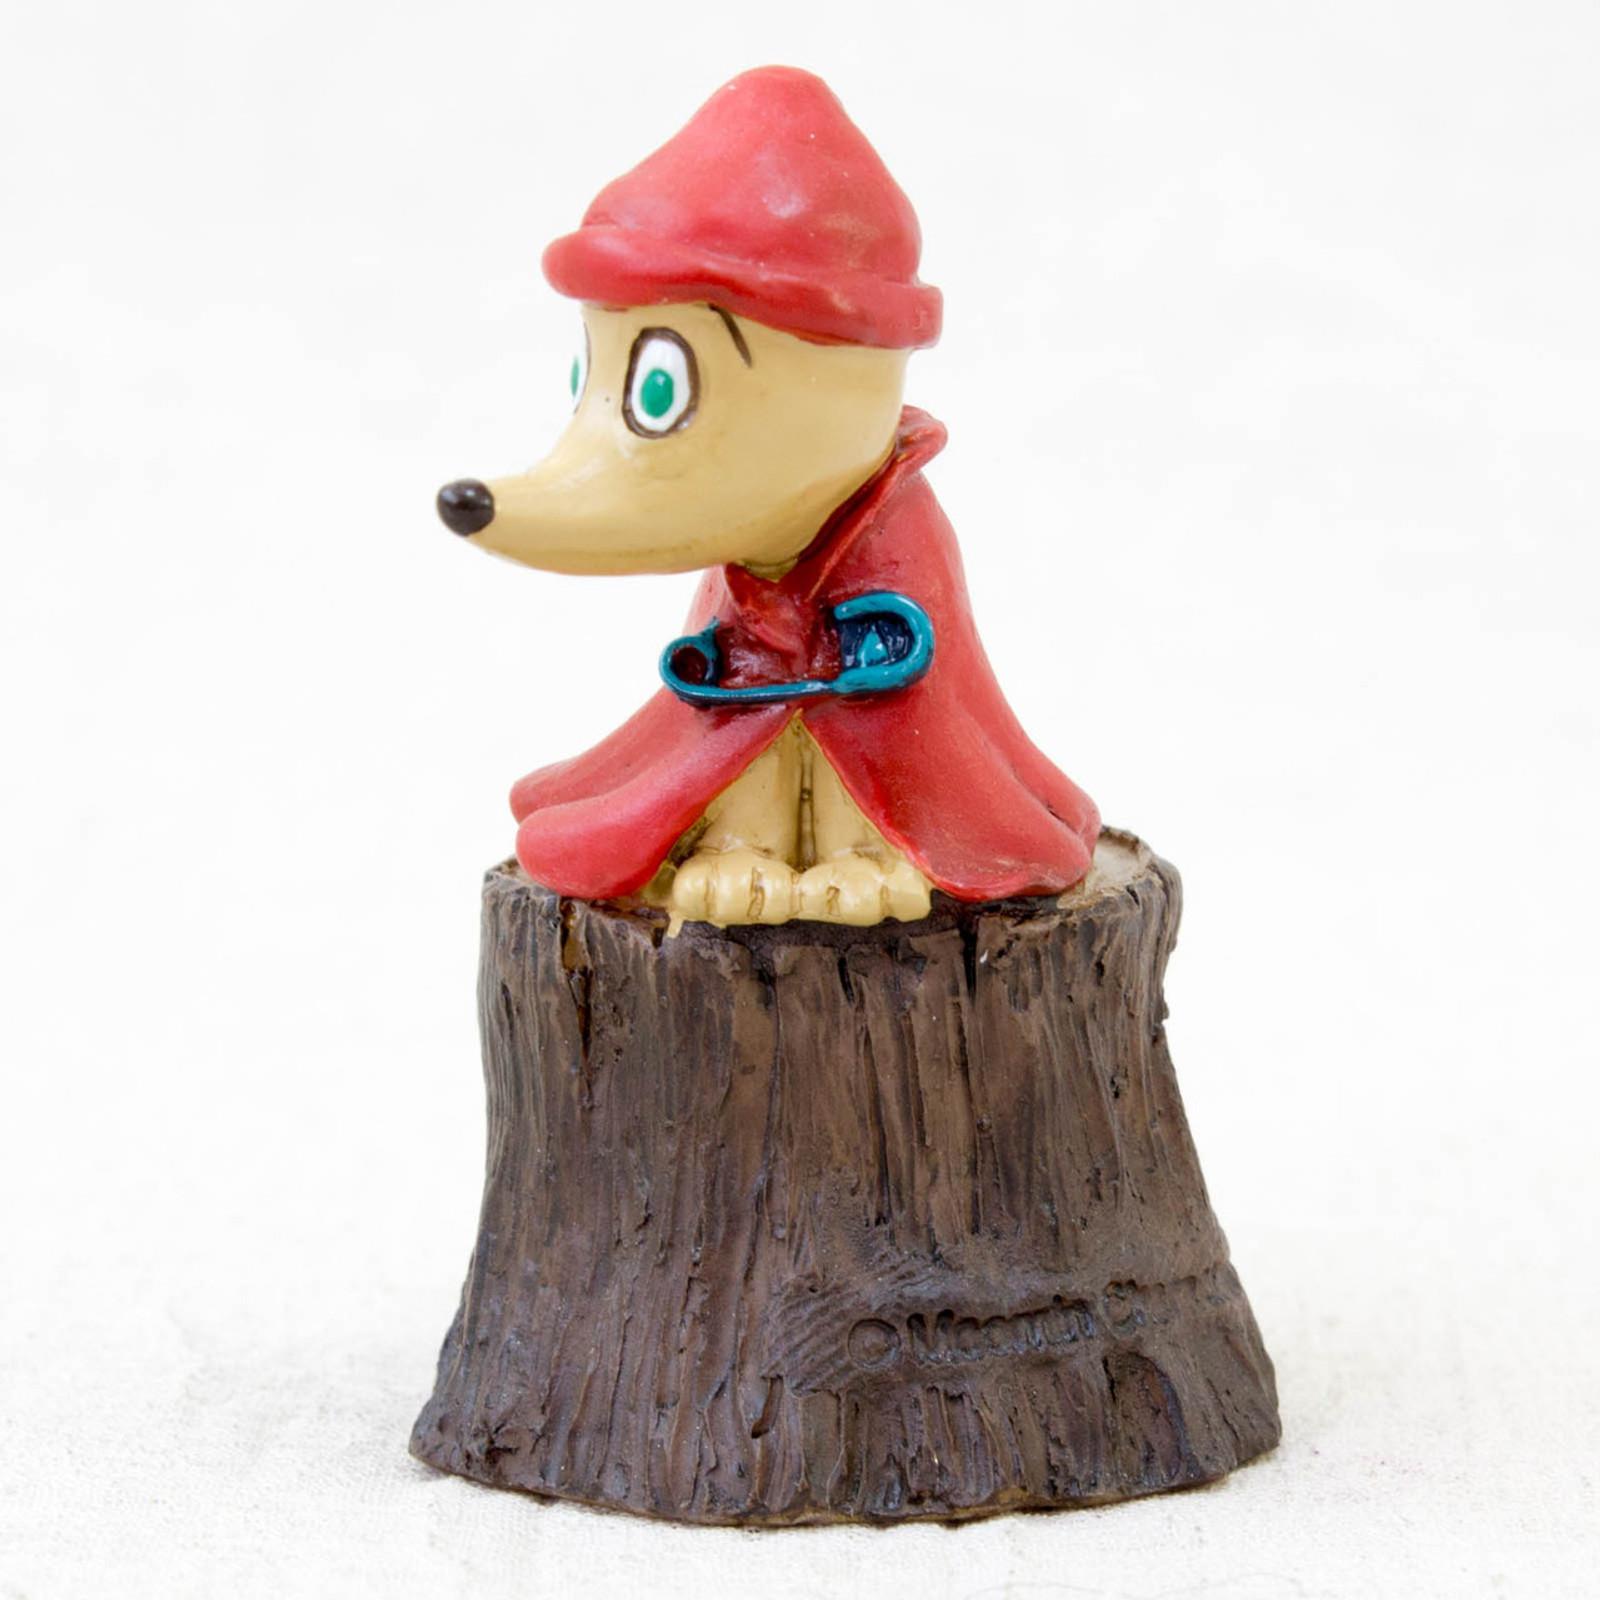 RARE! Moomin Characters Sorry-oo Original Comics Ver. Mini Figure Benelic